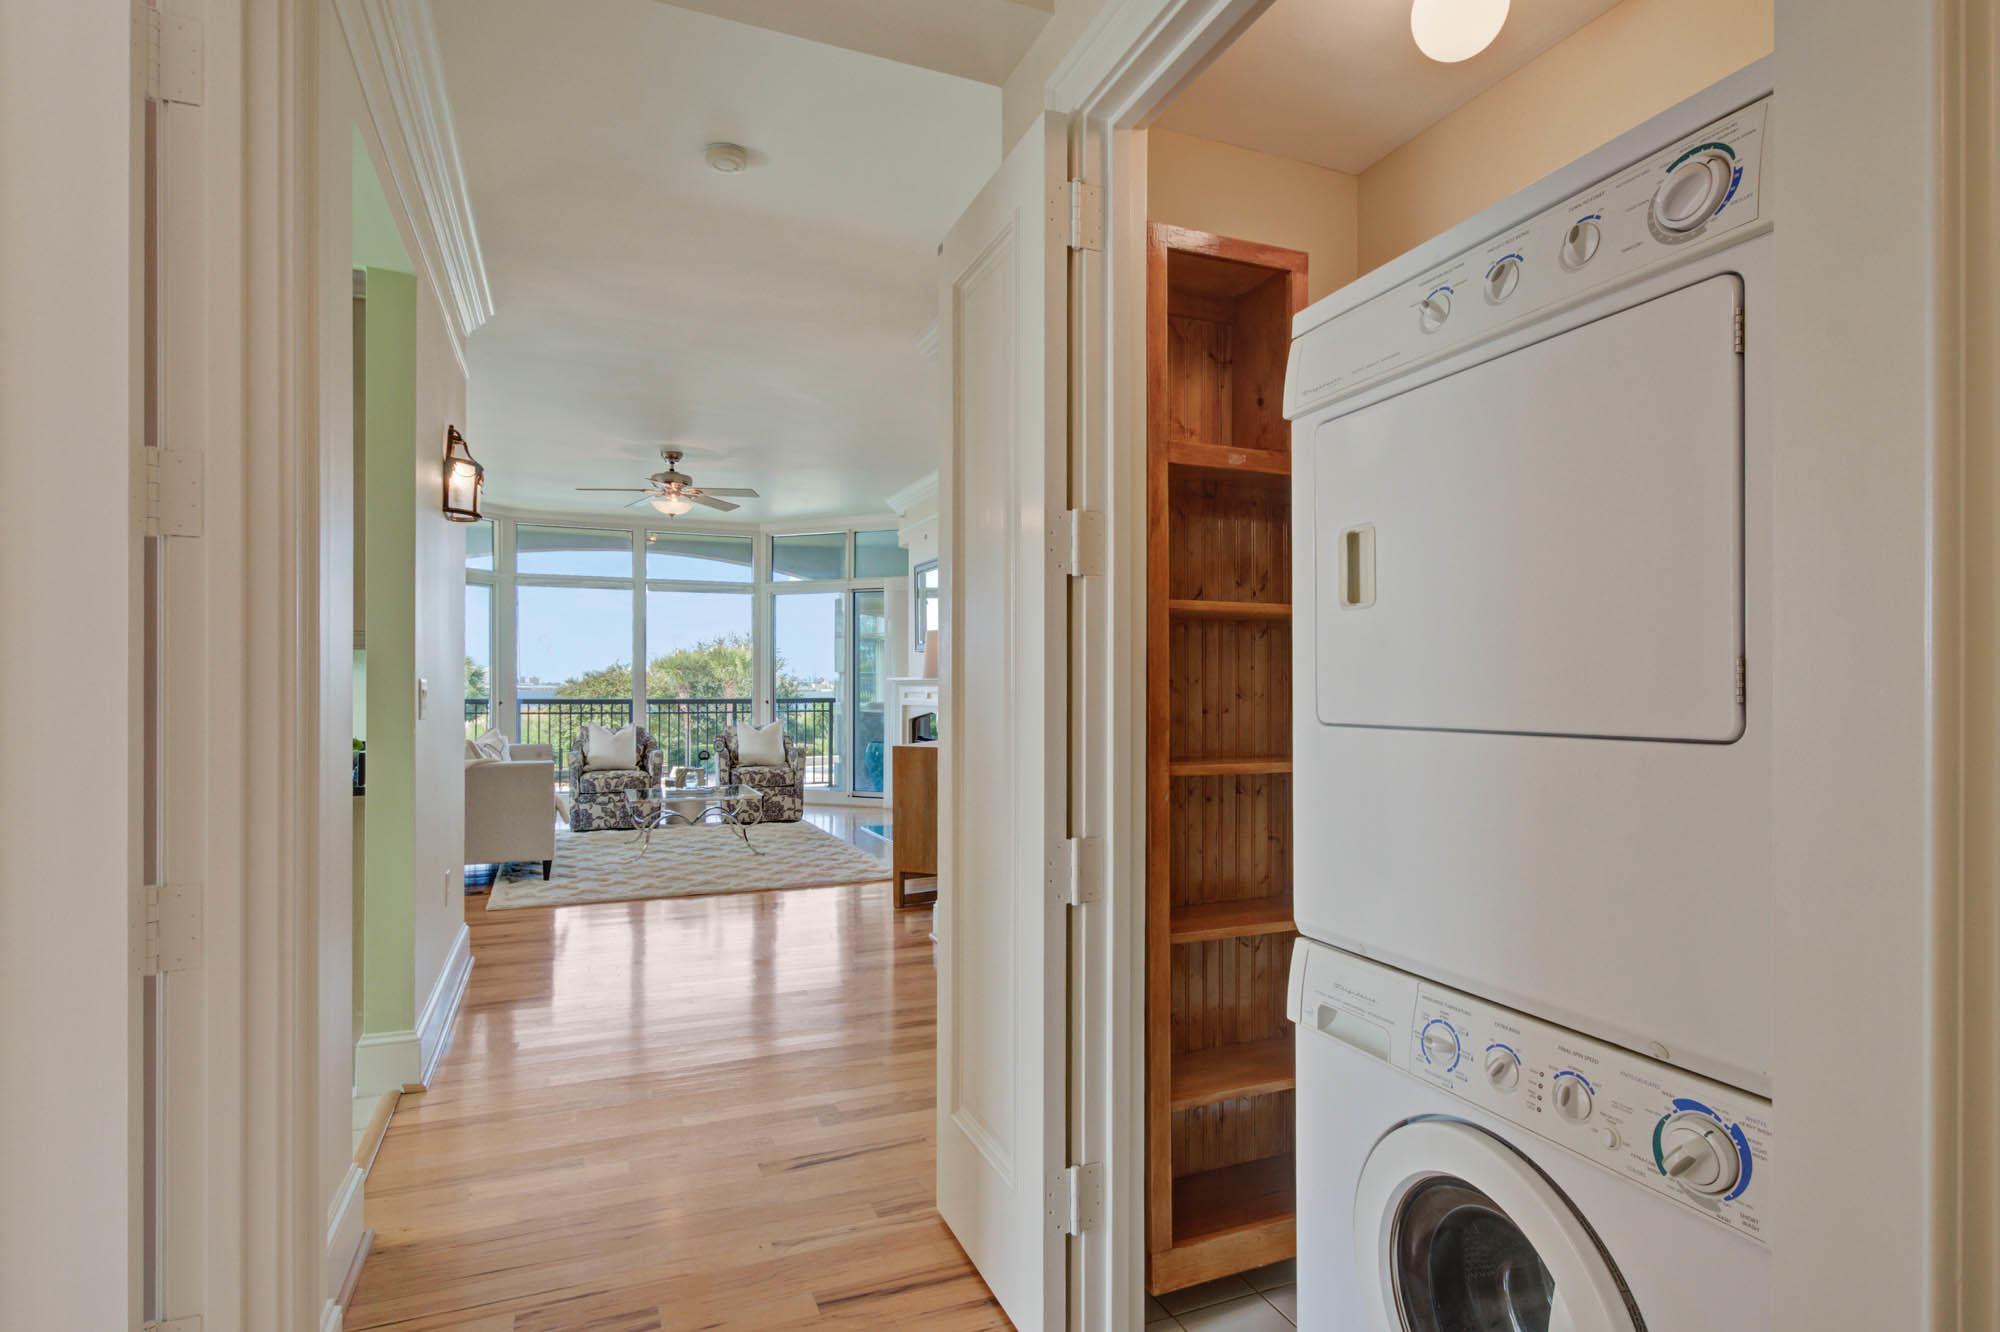 Renaissance On Chas Harbor Homes For Sale - 125 Plaza, Mount Pleasant, SC - 0